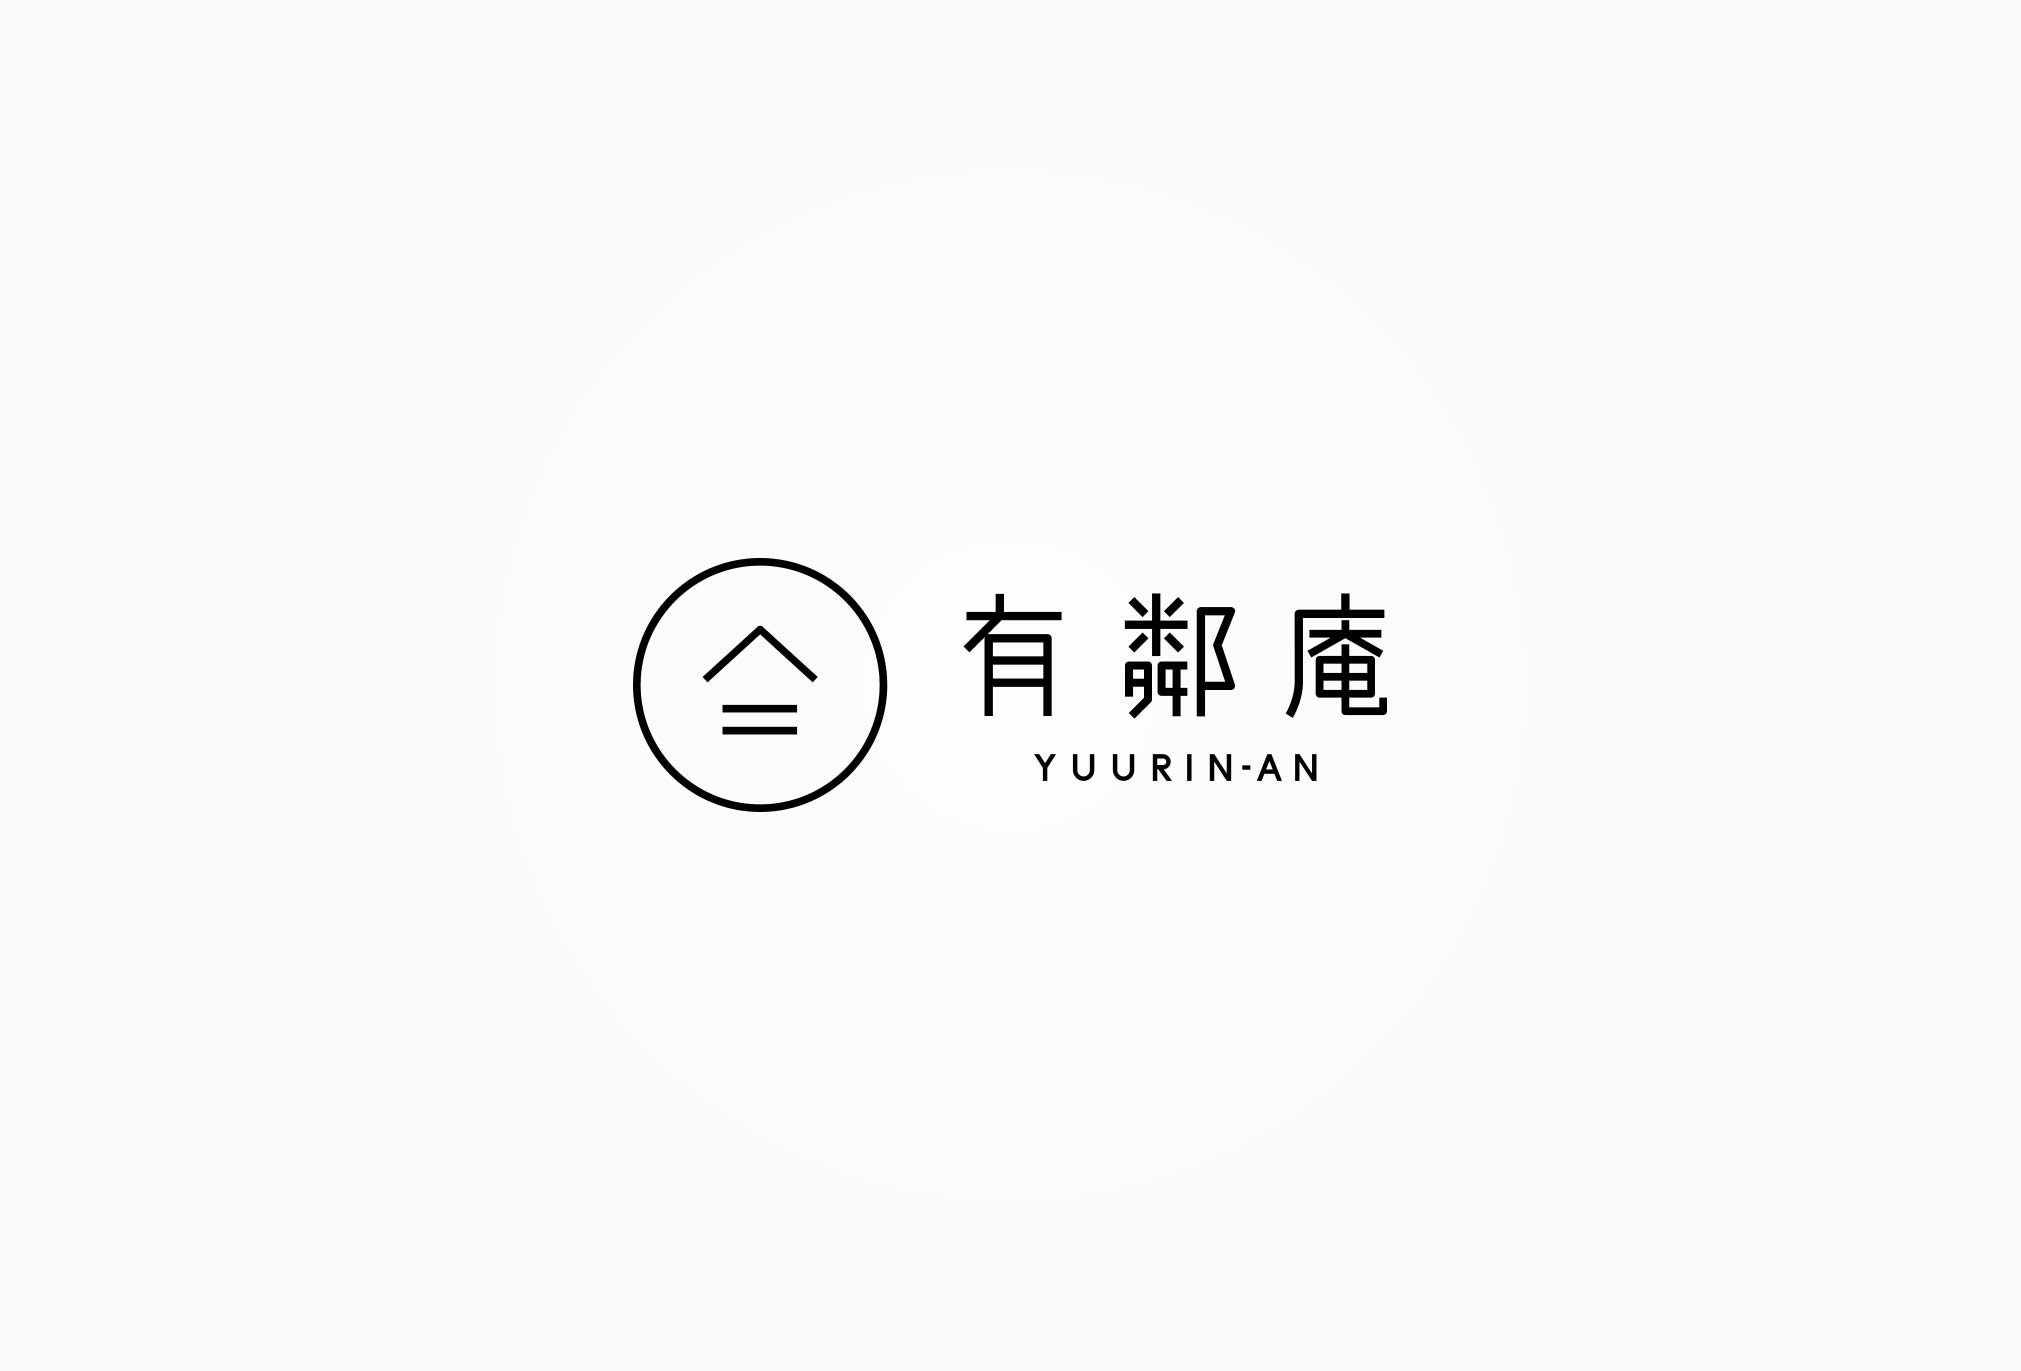 yuurin-an_logo3